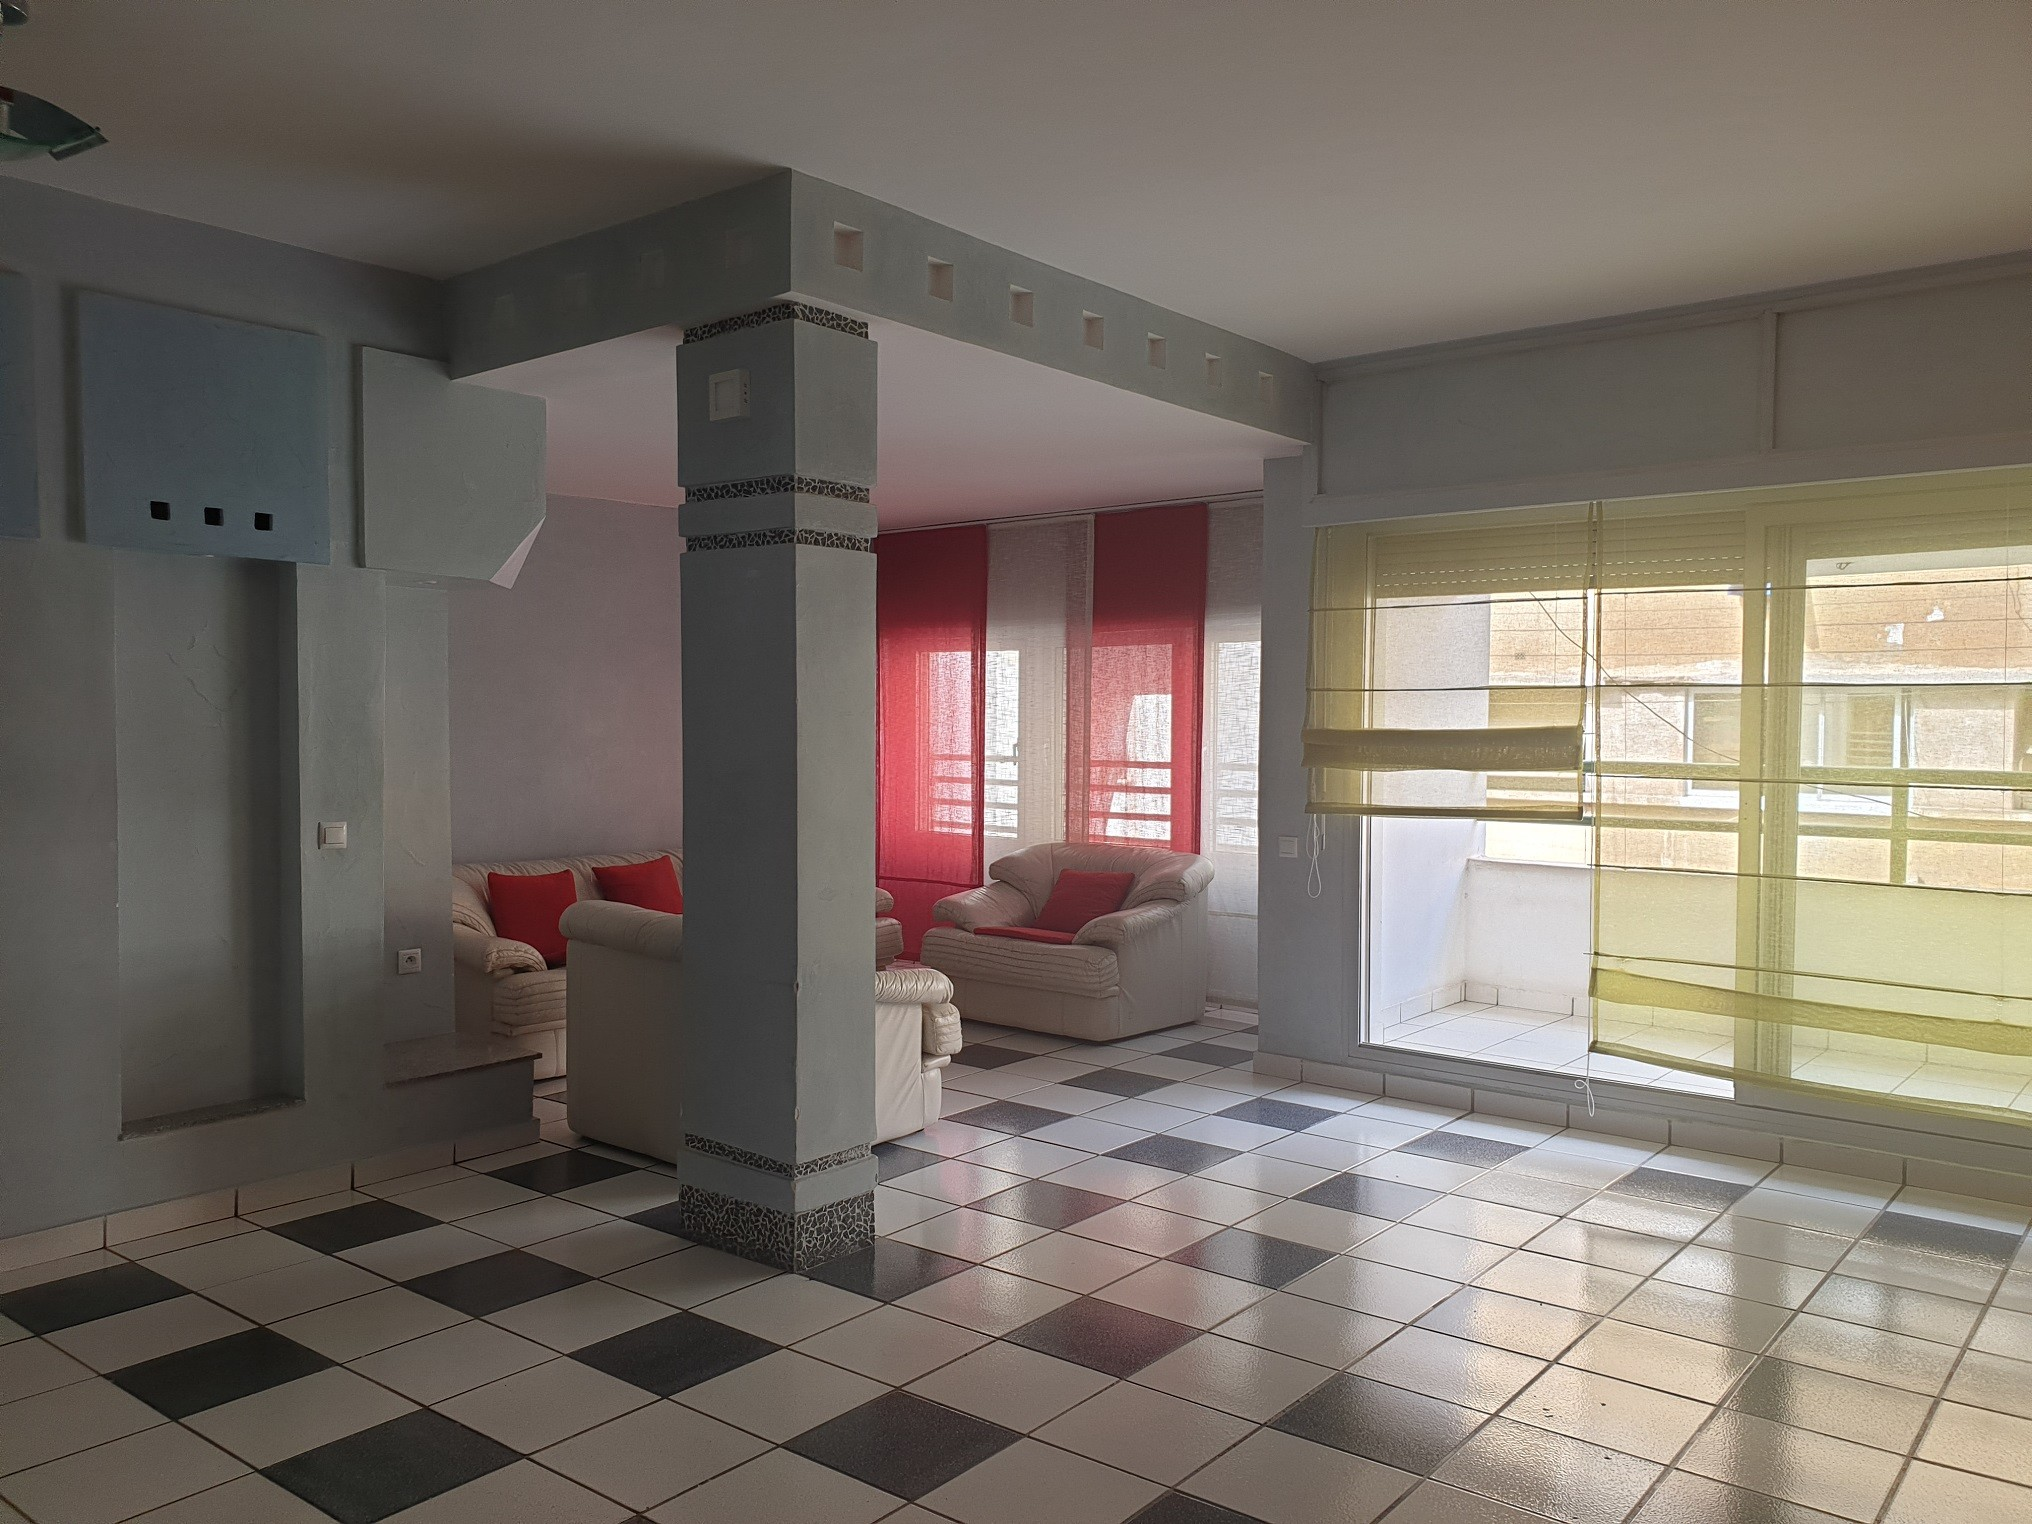 Vente <strong>Appartement</strong> Casablanca Maarif Extension <strong>157 m2</strong>